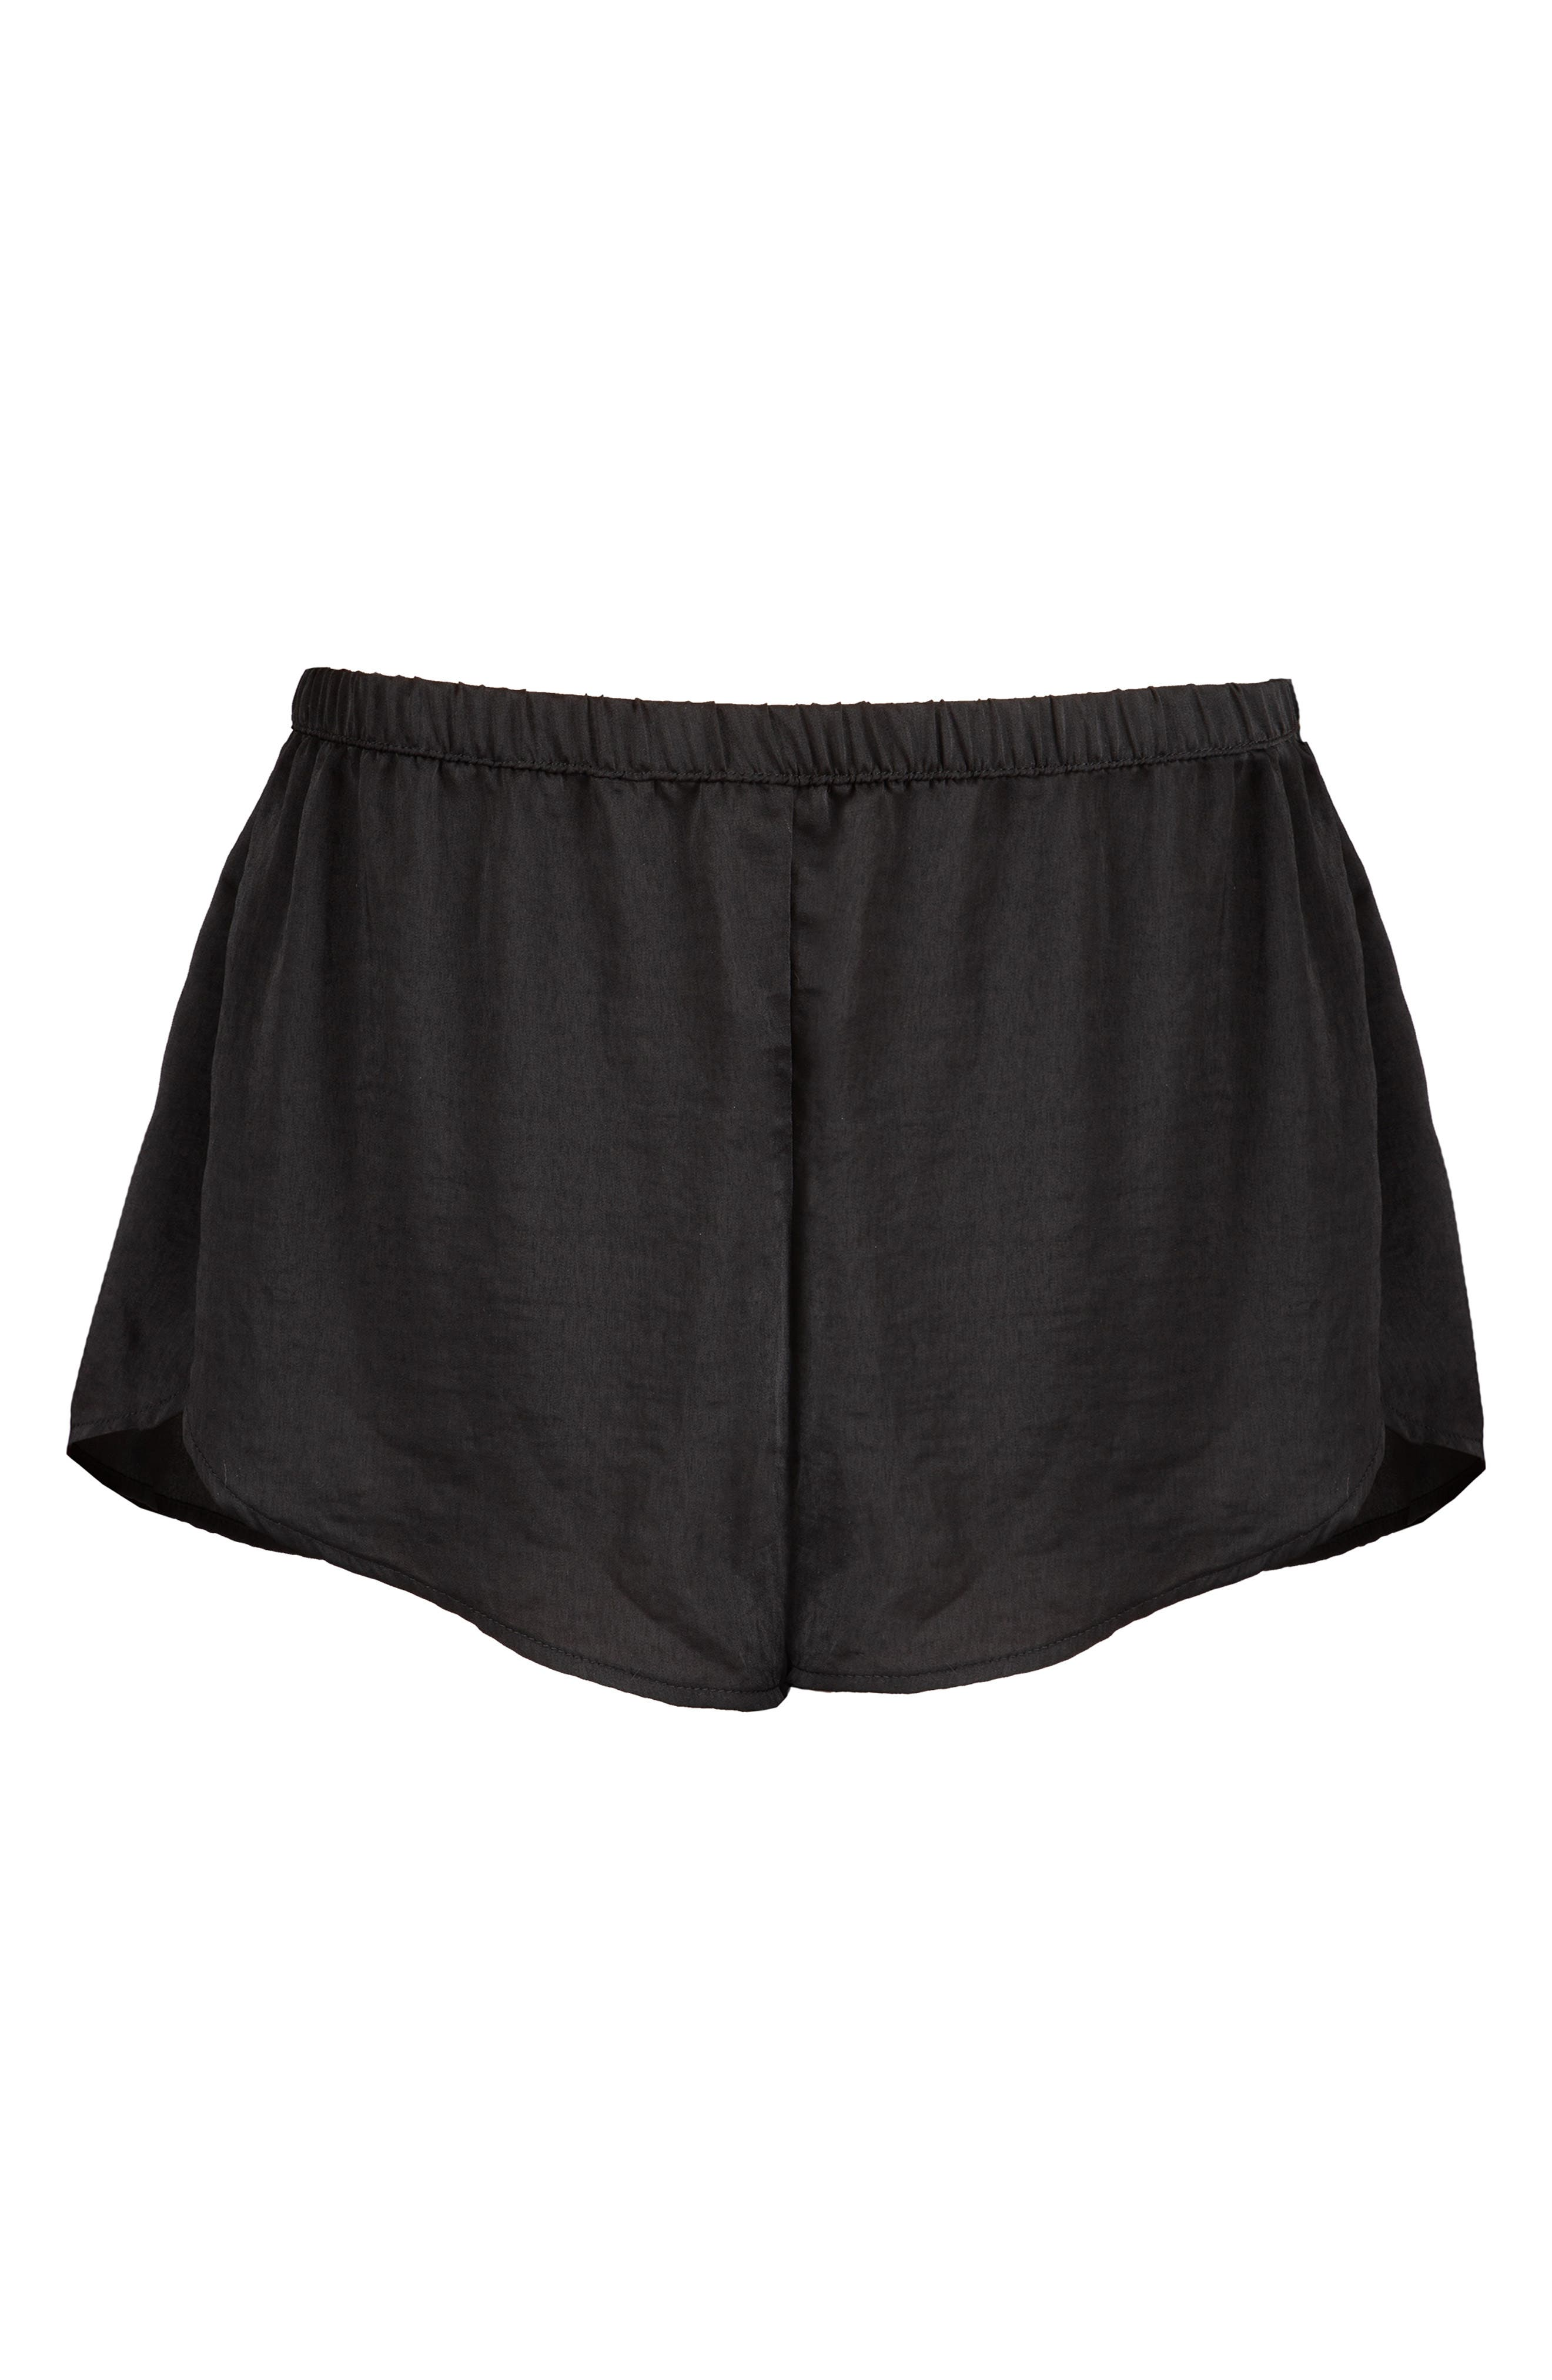 The Boxer Lounge Shorts